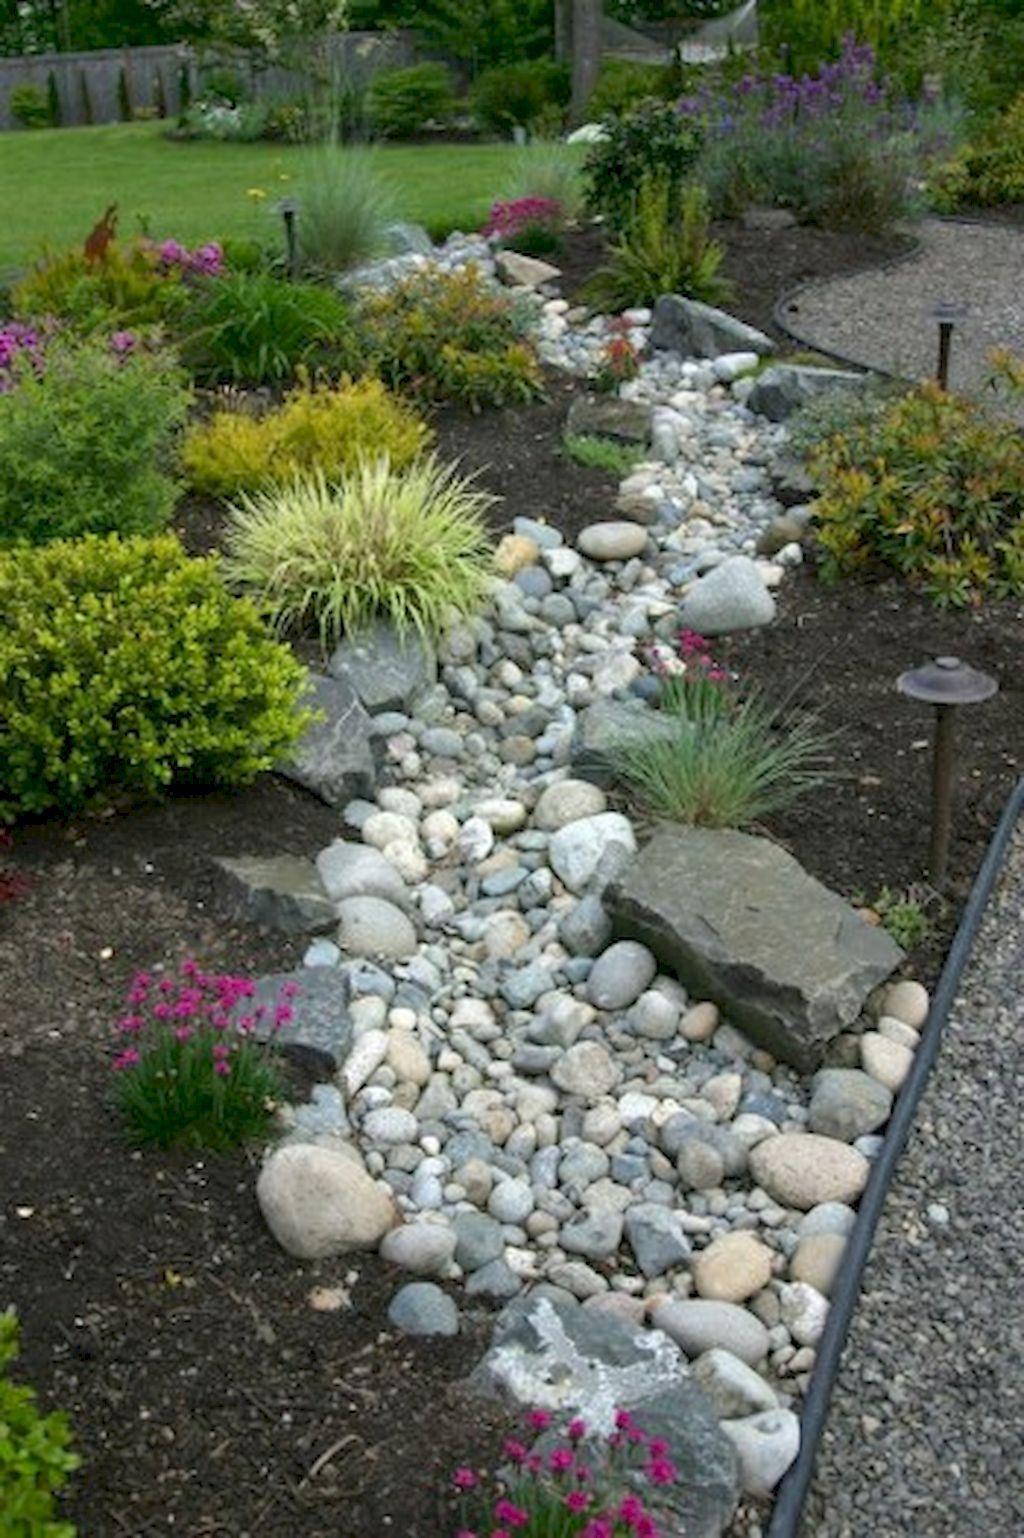 Gorgeous 60 Wonderful Ideas for Backyard Landscaping https://decorapatio.com/2017/05/31/60-wonderful-ideas-backyard-landscaping/